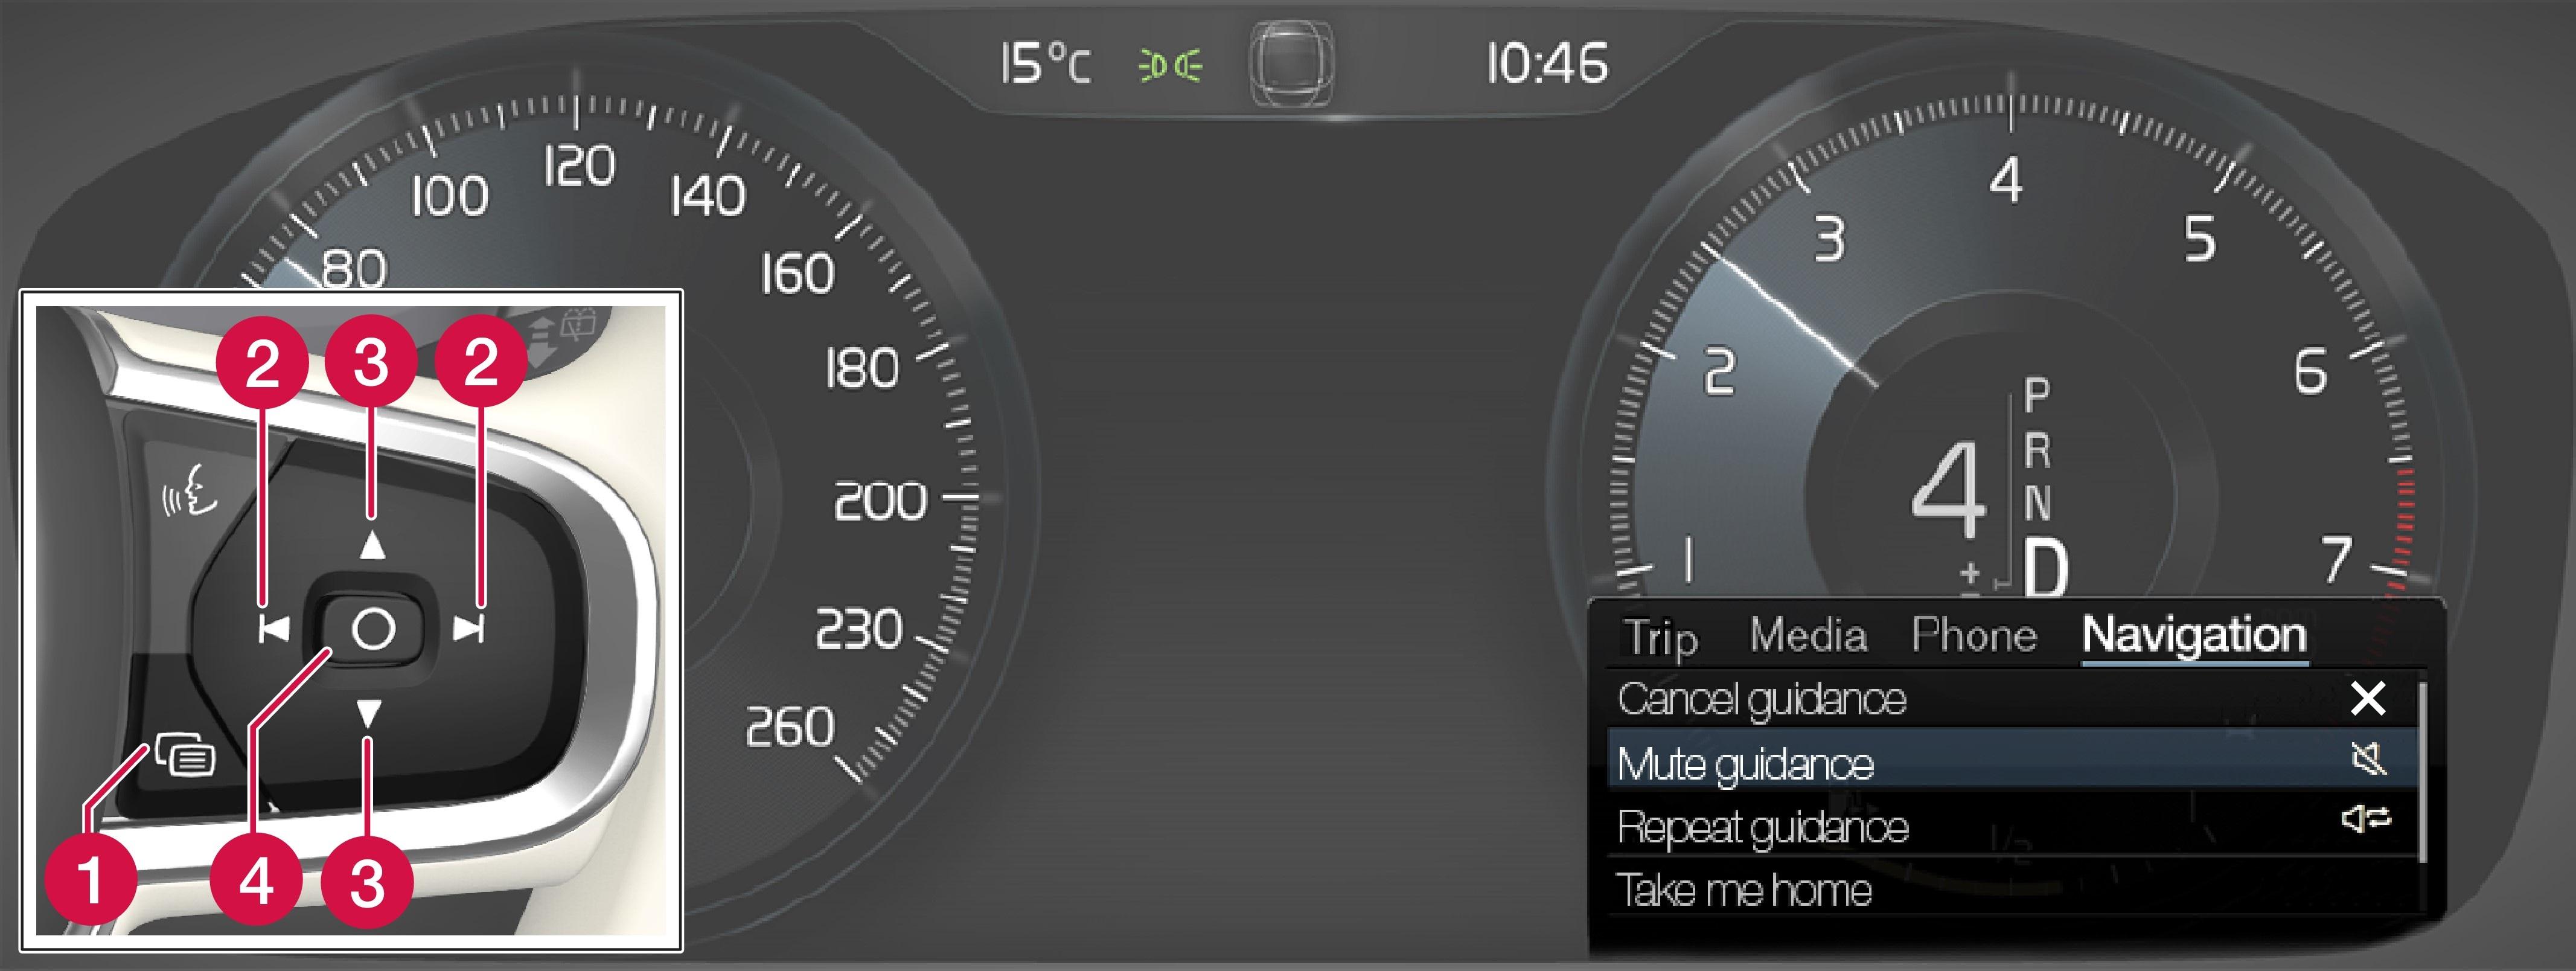 P5-1617-Navi-App menu and right steering wheel switch (RoW)